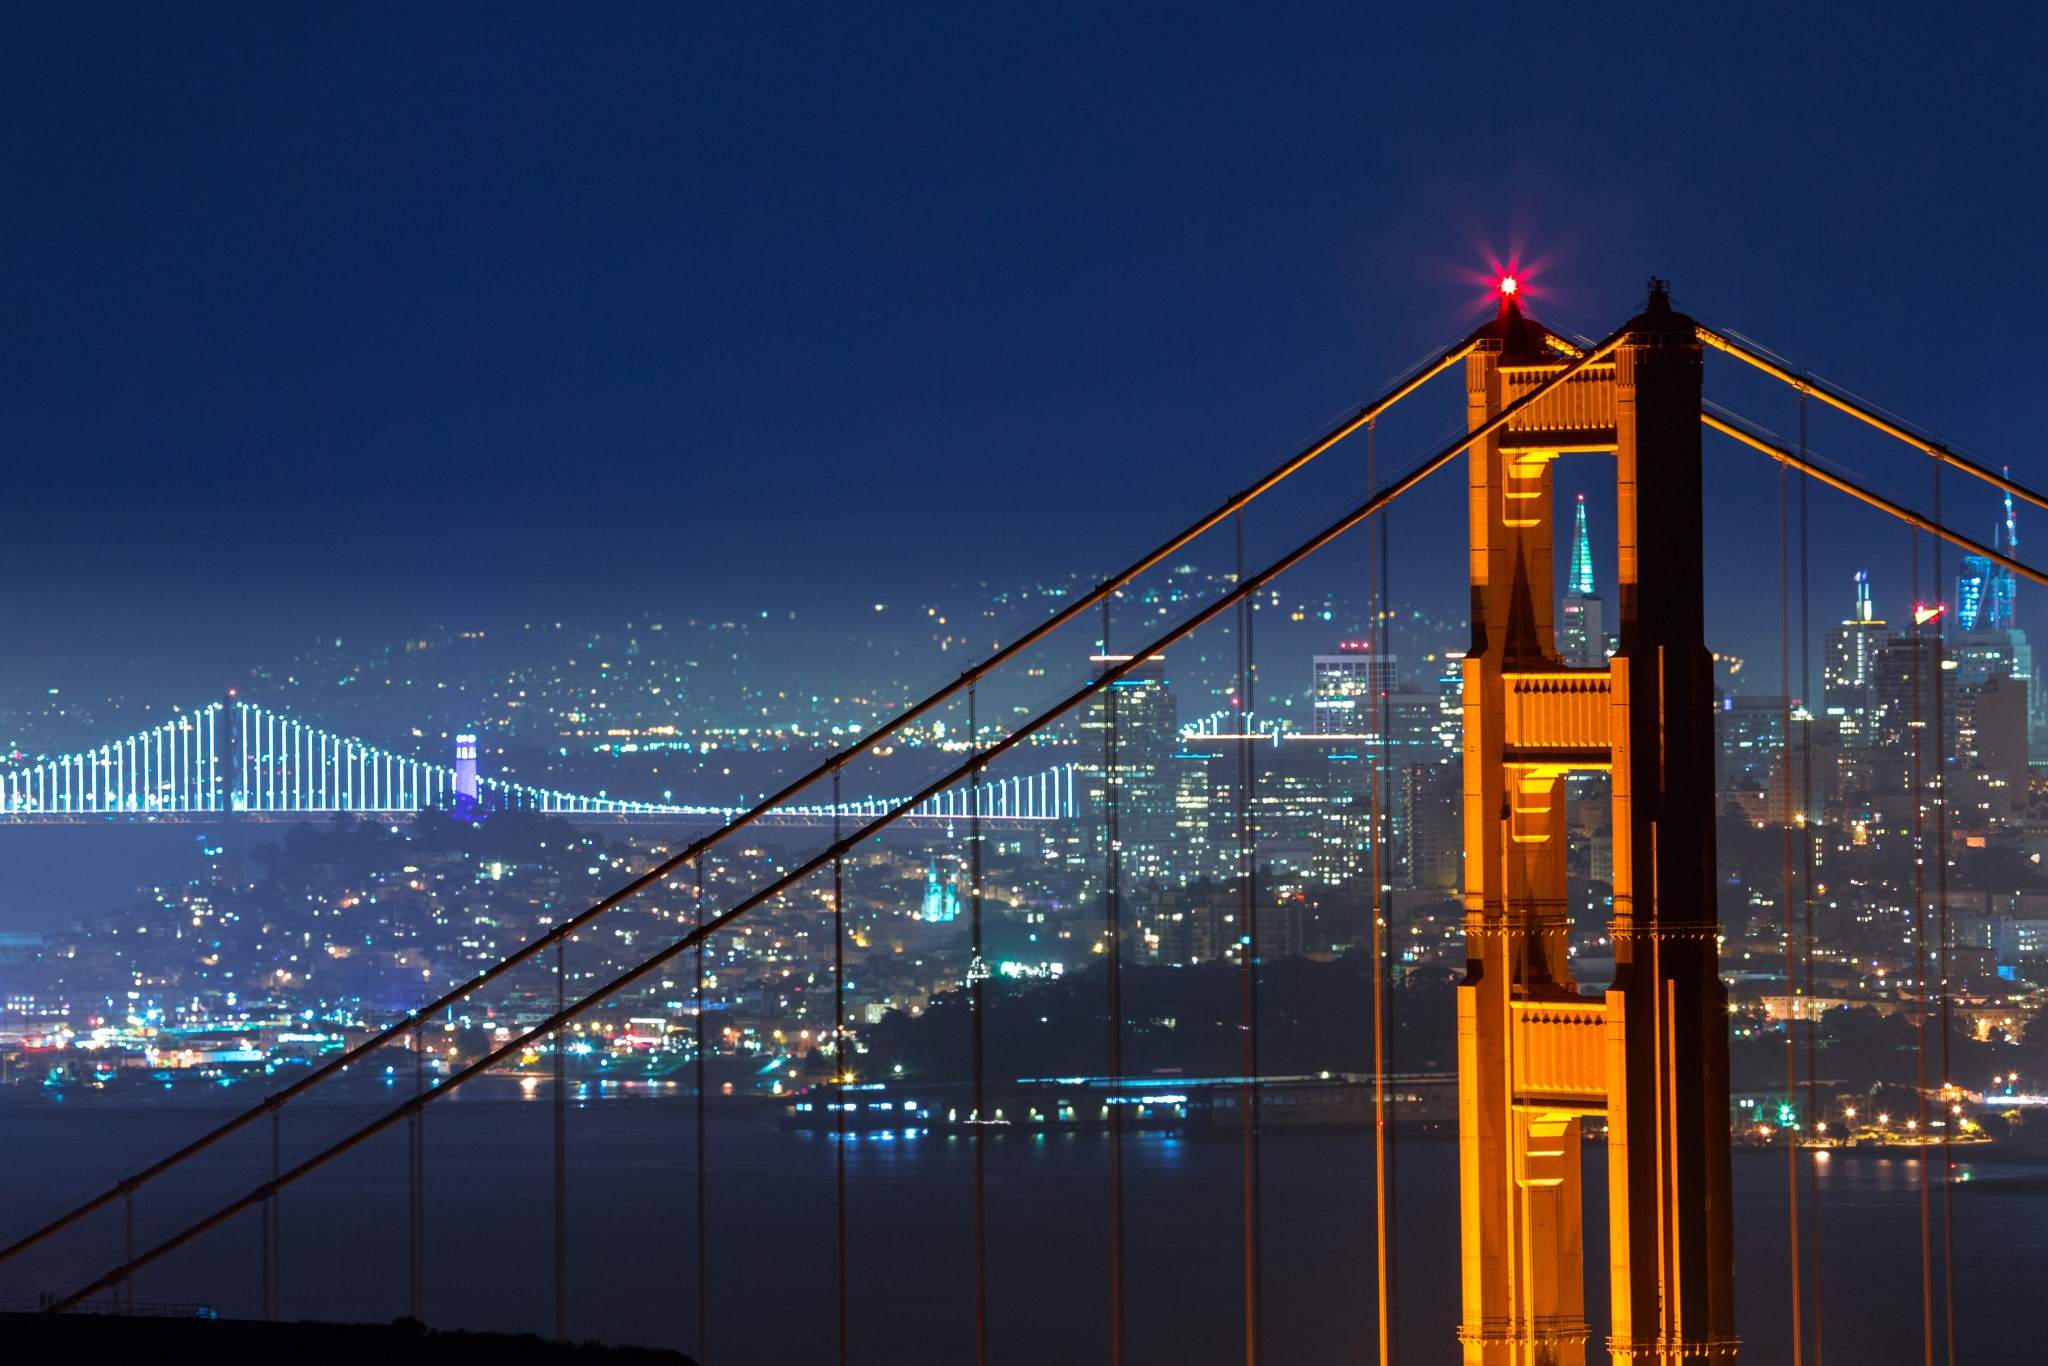 Golden Gate Bridge by Dianachang